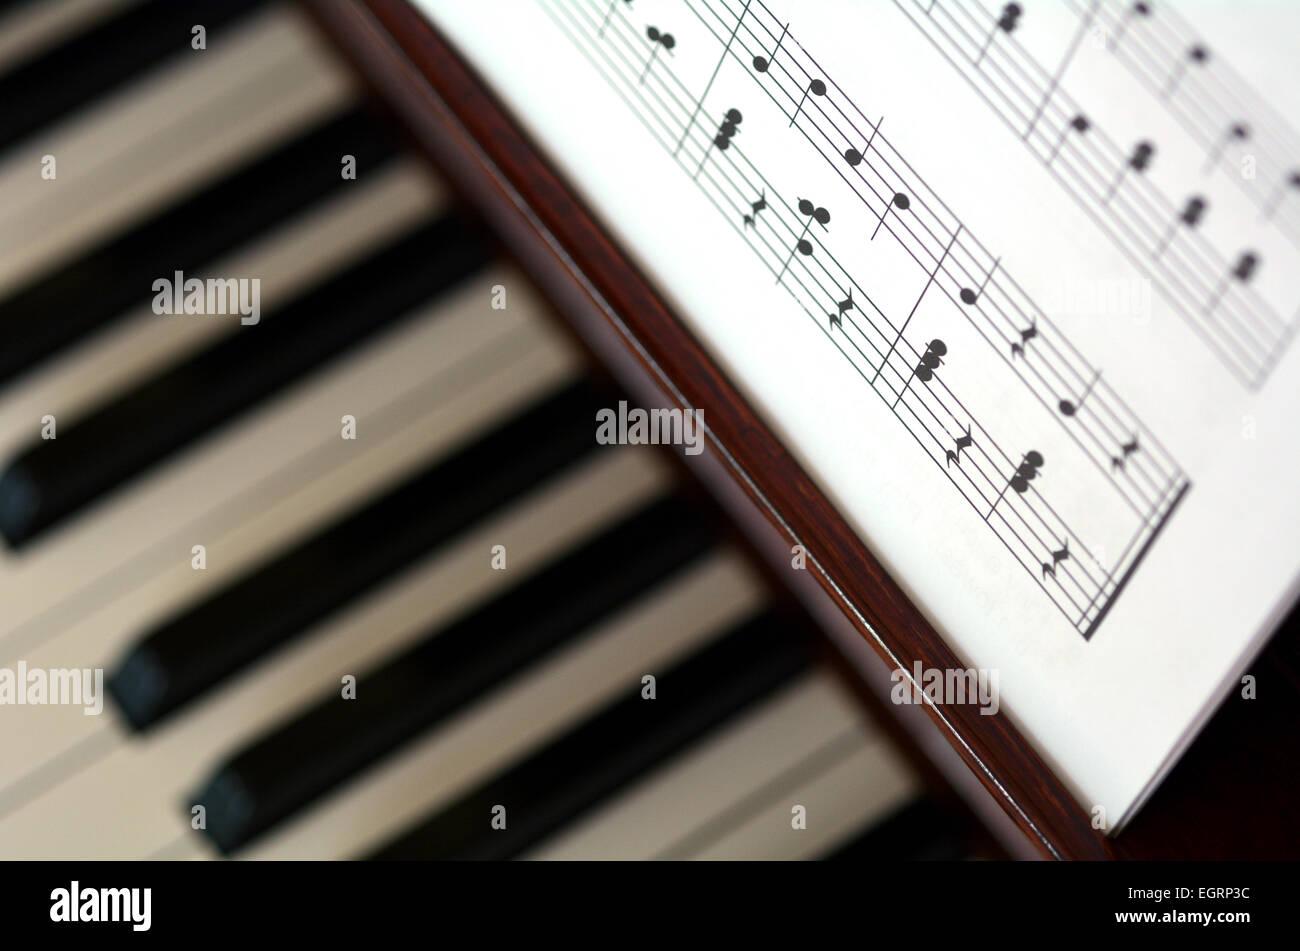 Piano Music Notes Close Up Of A Piano Musical Notes And Symbols